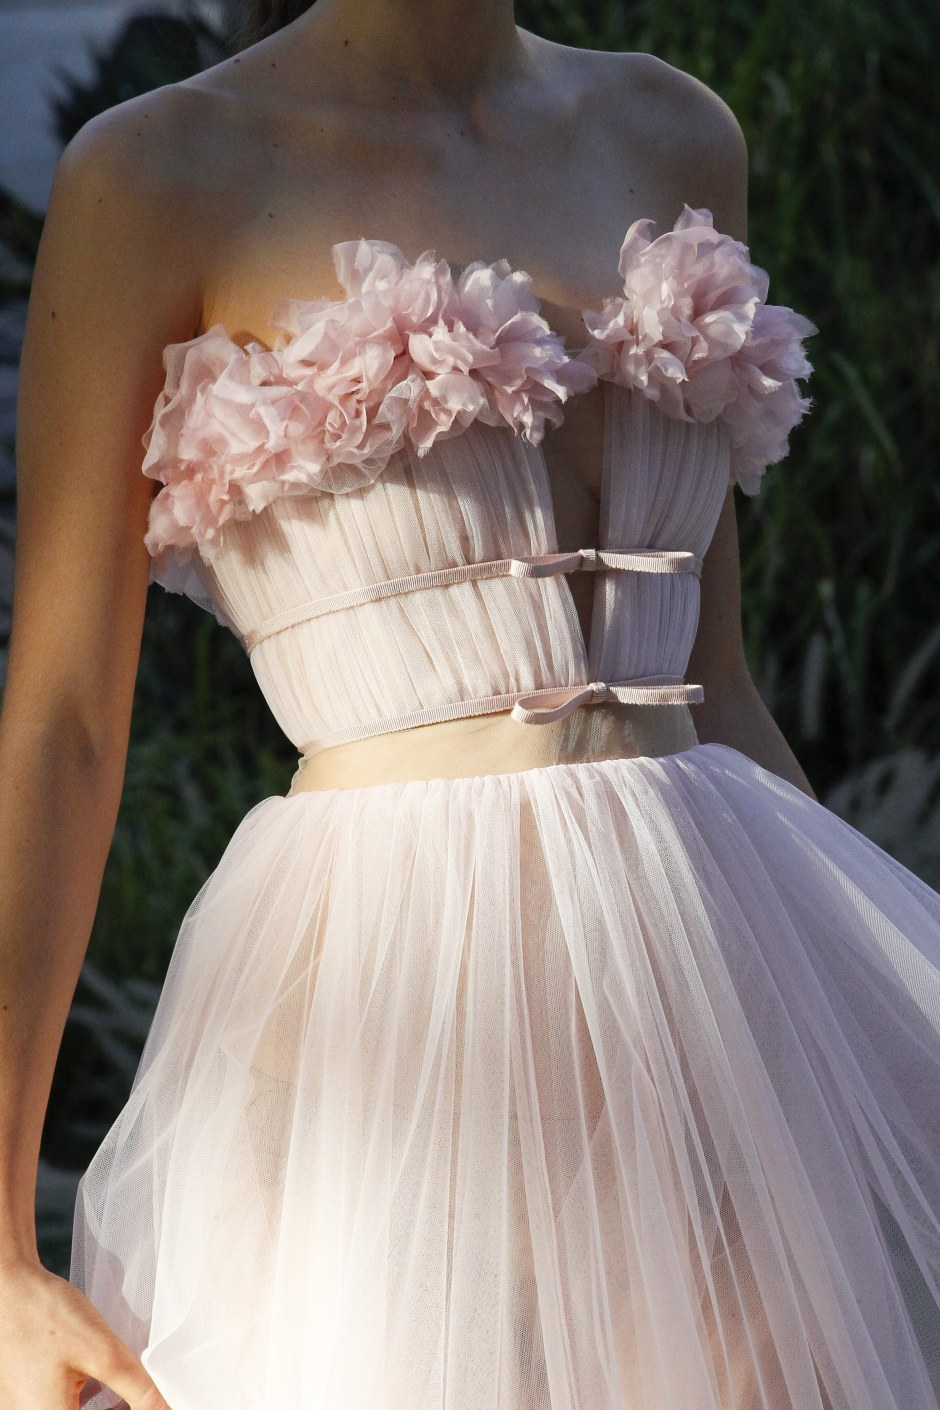 Giambattista Valli Haute Couture Spring Summer 2018